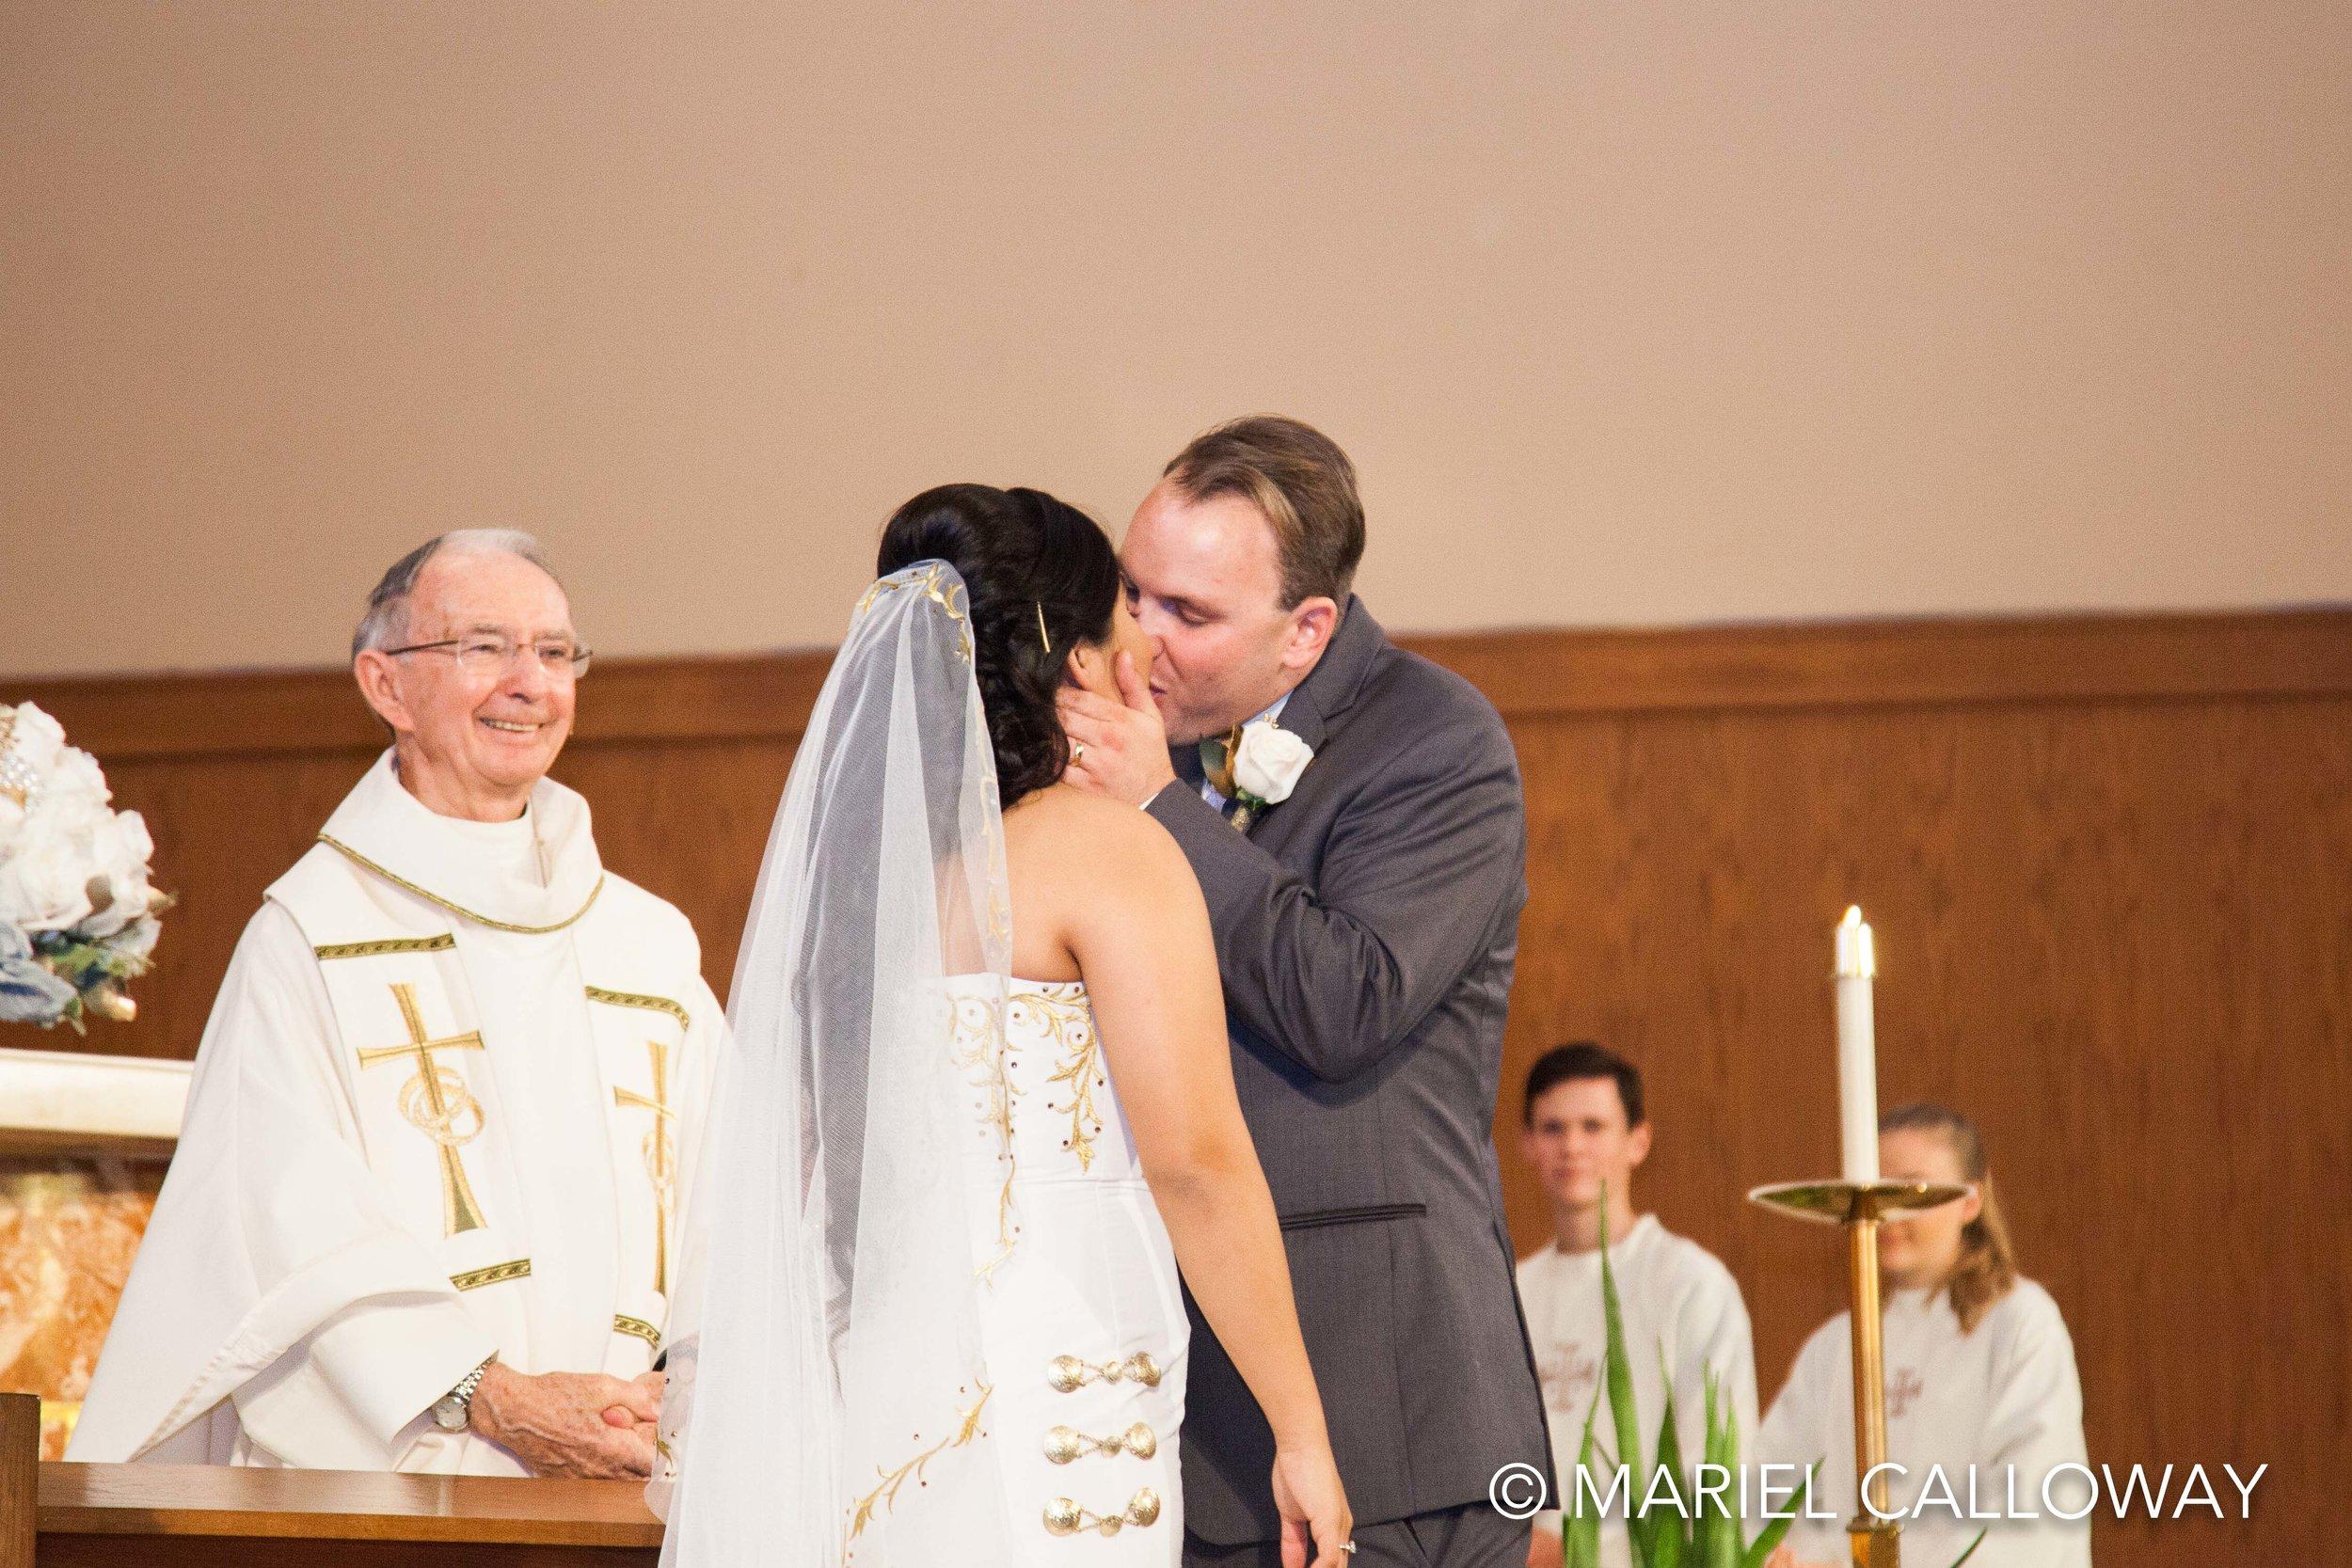 Mariel-Calloway-Los-Angeles-Wedding-Photography-Rossi-50.jpg